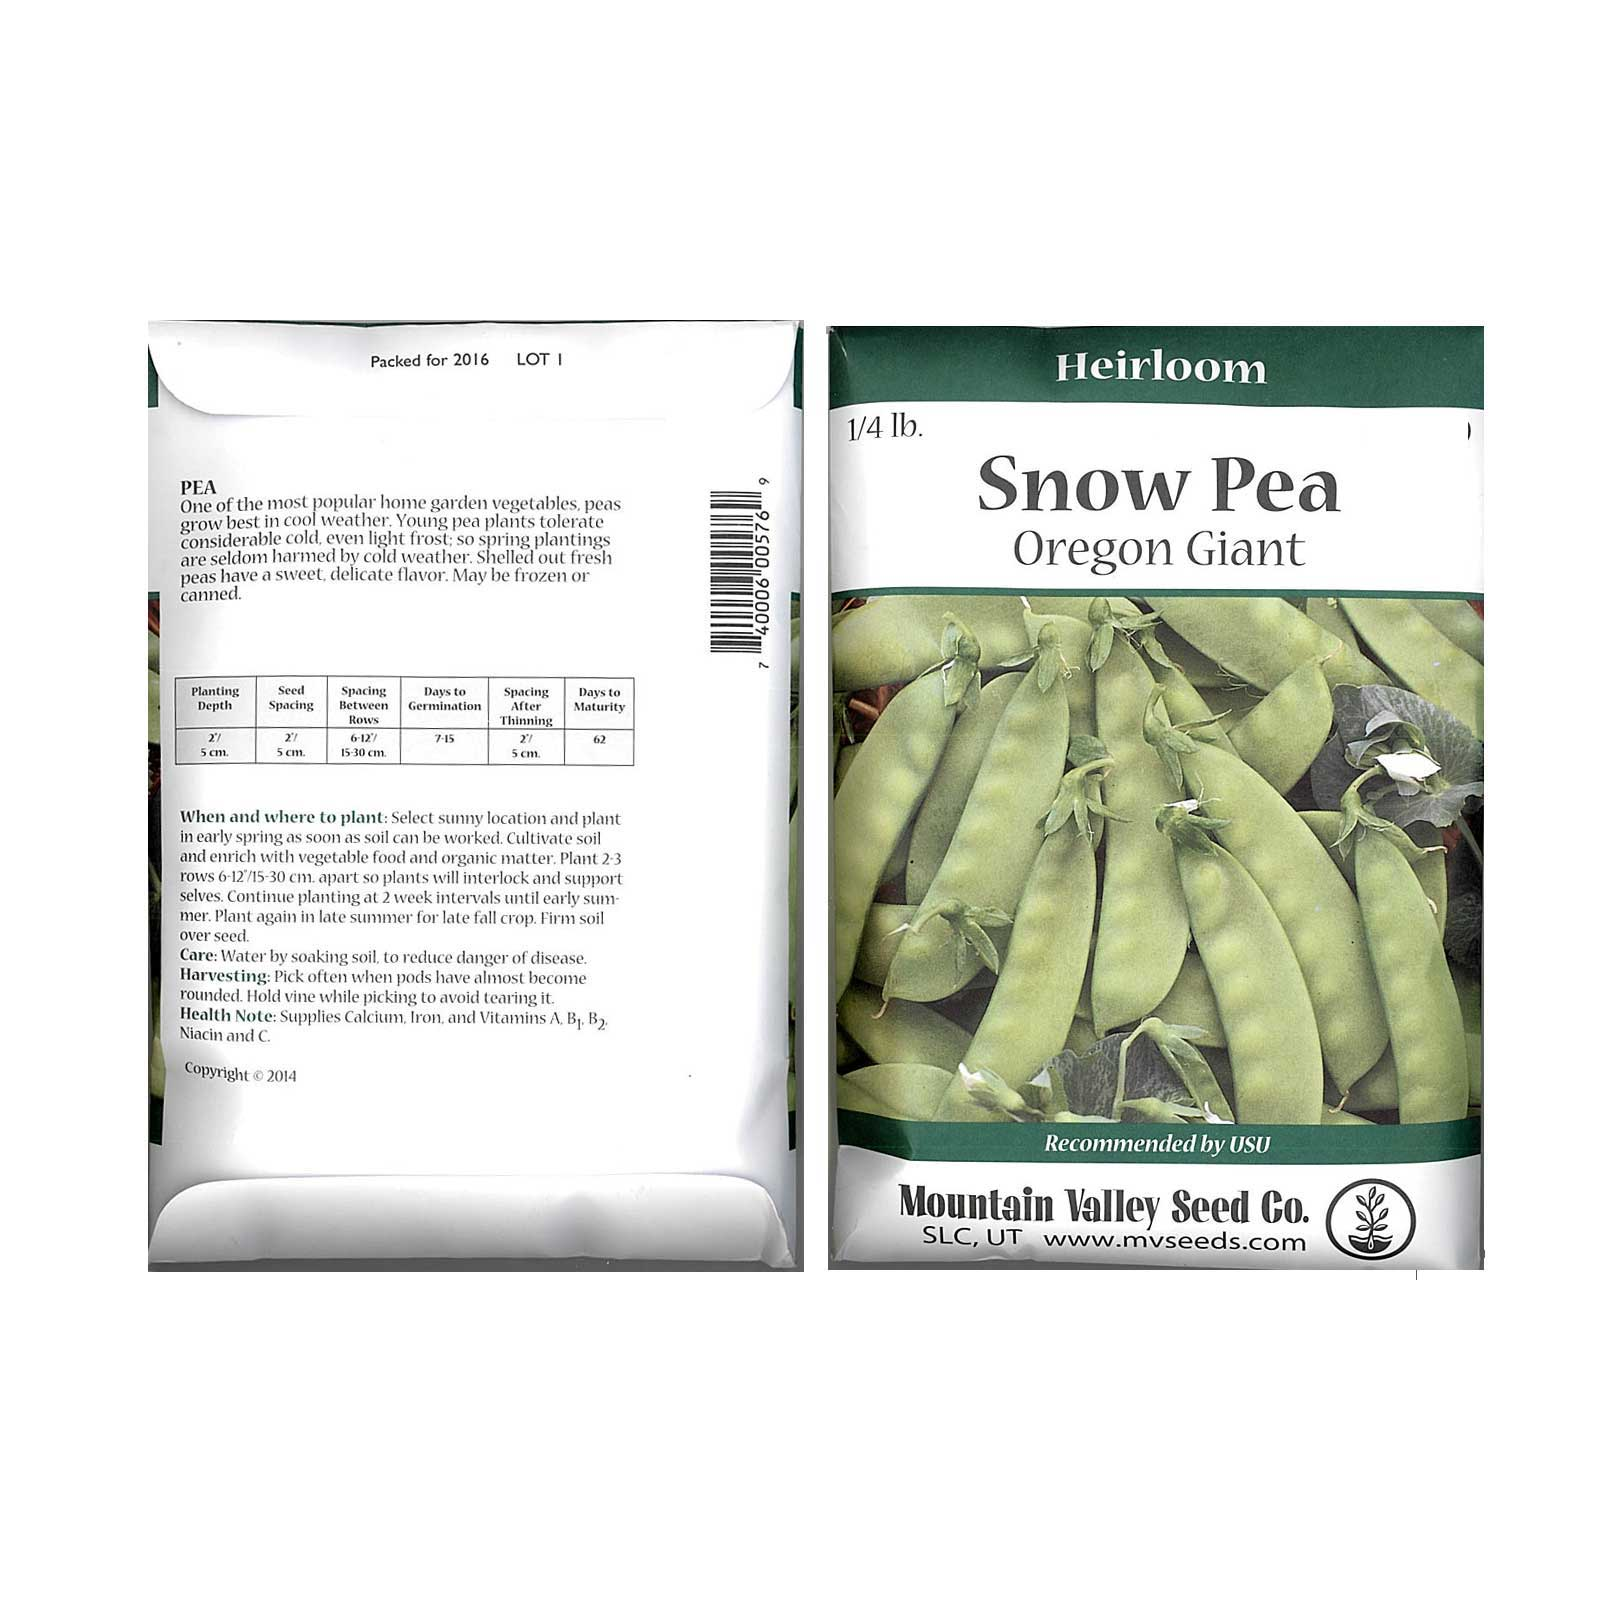 PEAS OREGON GIANT PEAS 1 LB  NON GMO HEIRLOOM Seed   FREE Shipping